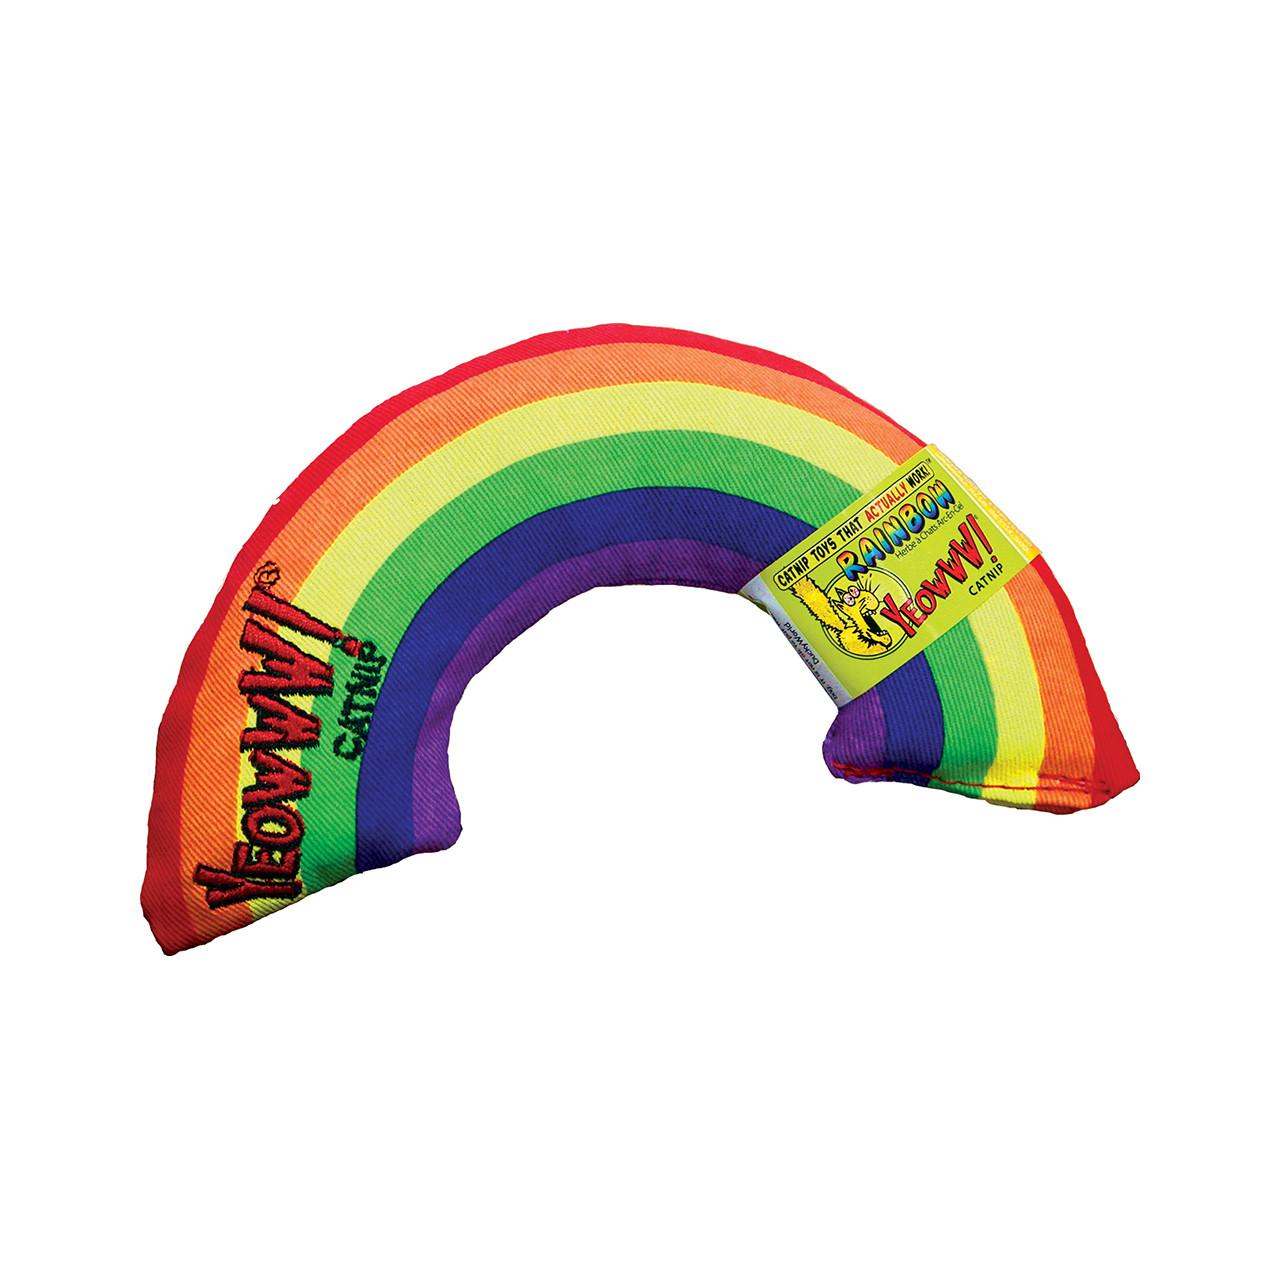 YEOWWW! Rainbow Catnip Filled Cat Toy